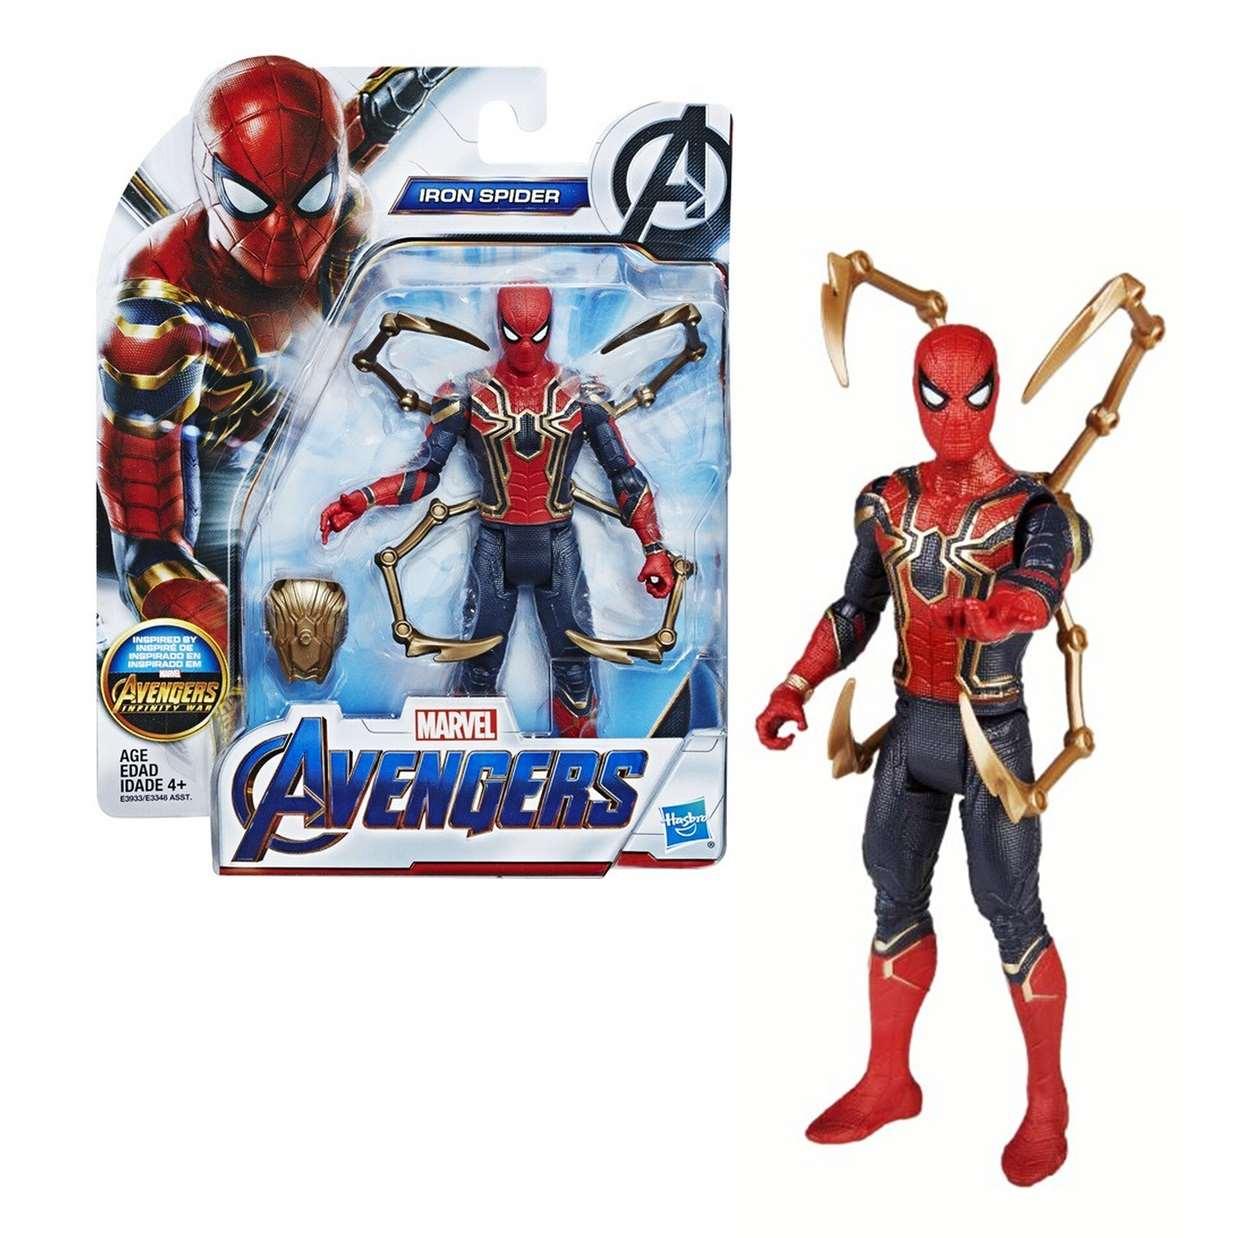 Iron Spider Figura Marvel Avengers End Game 6 PuLG